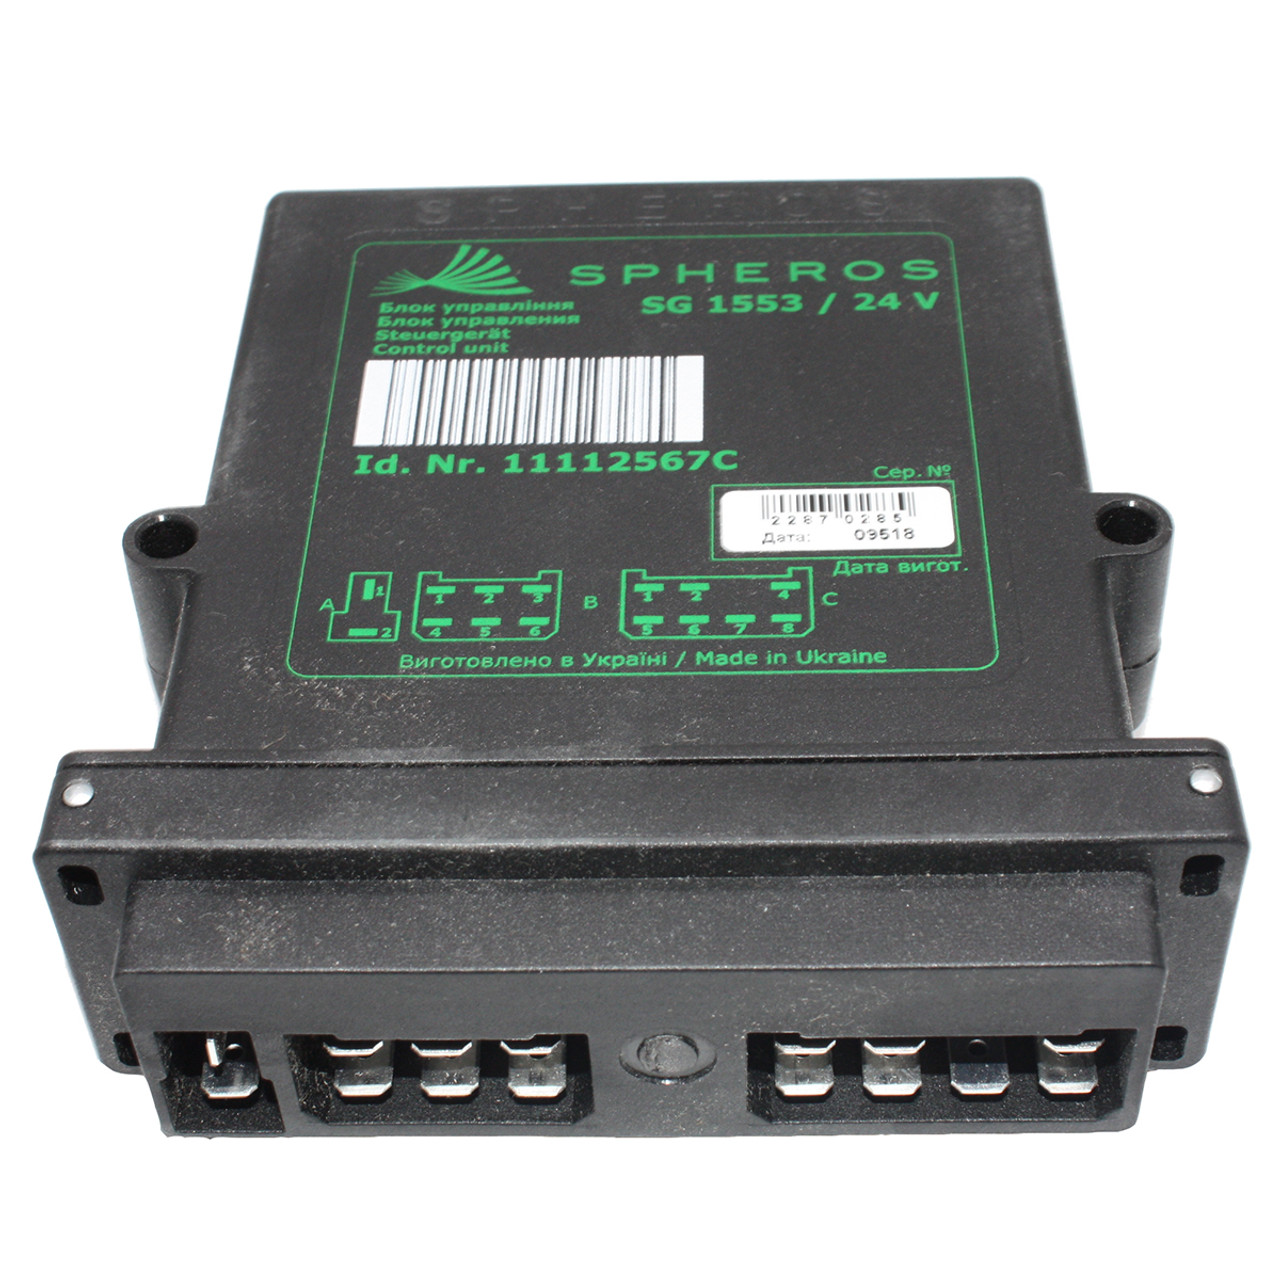 Webasto / Spheros DBW 30kW Control Unit SG 1553 24v on